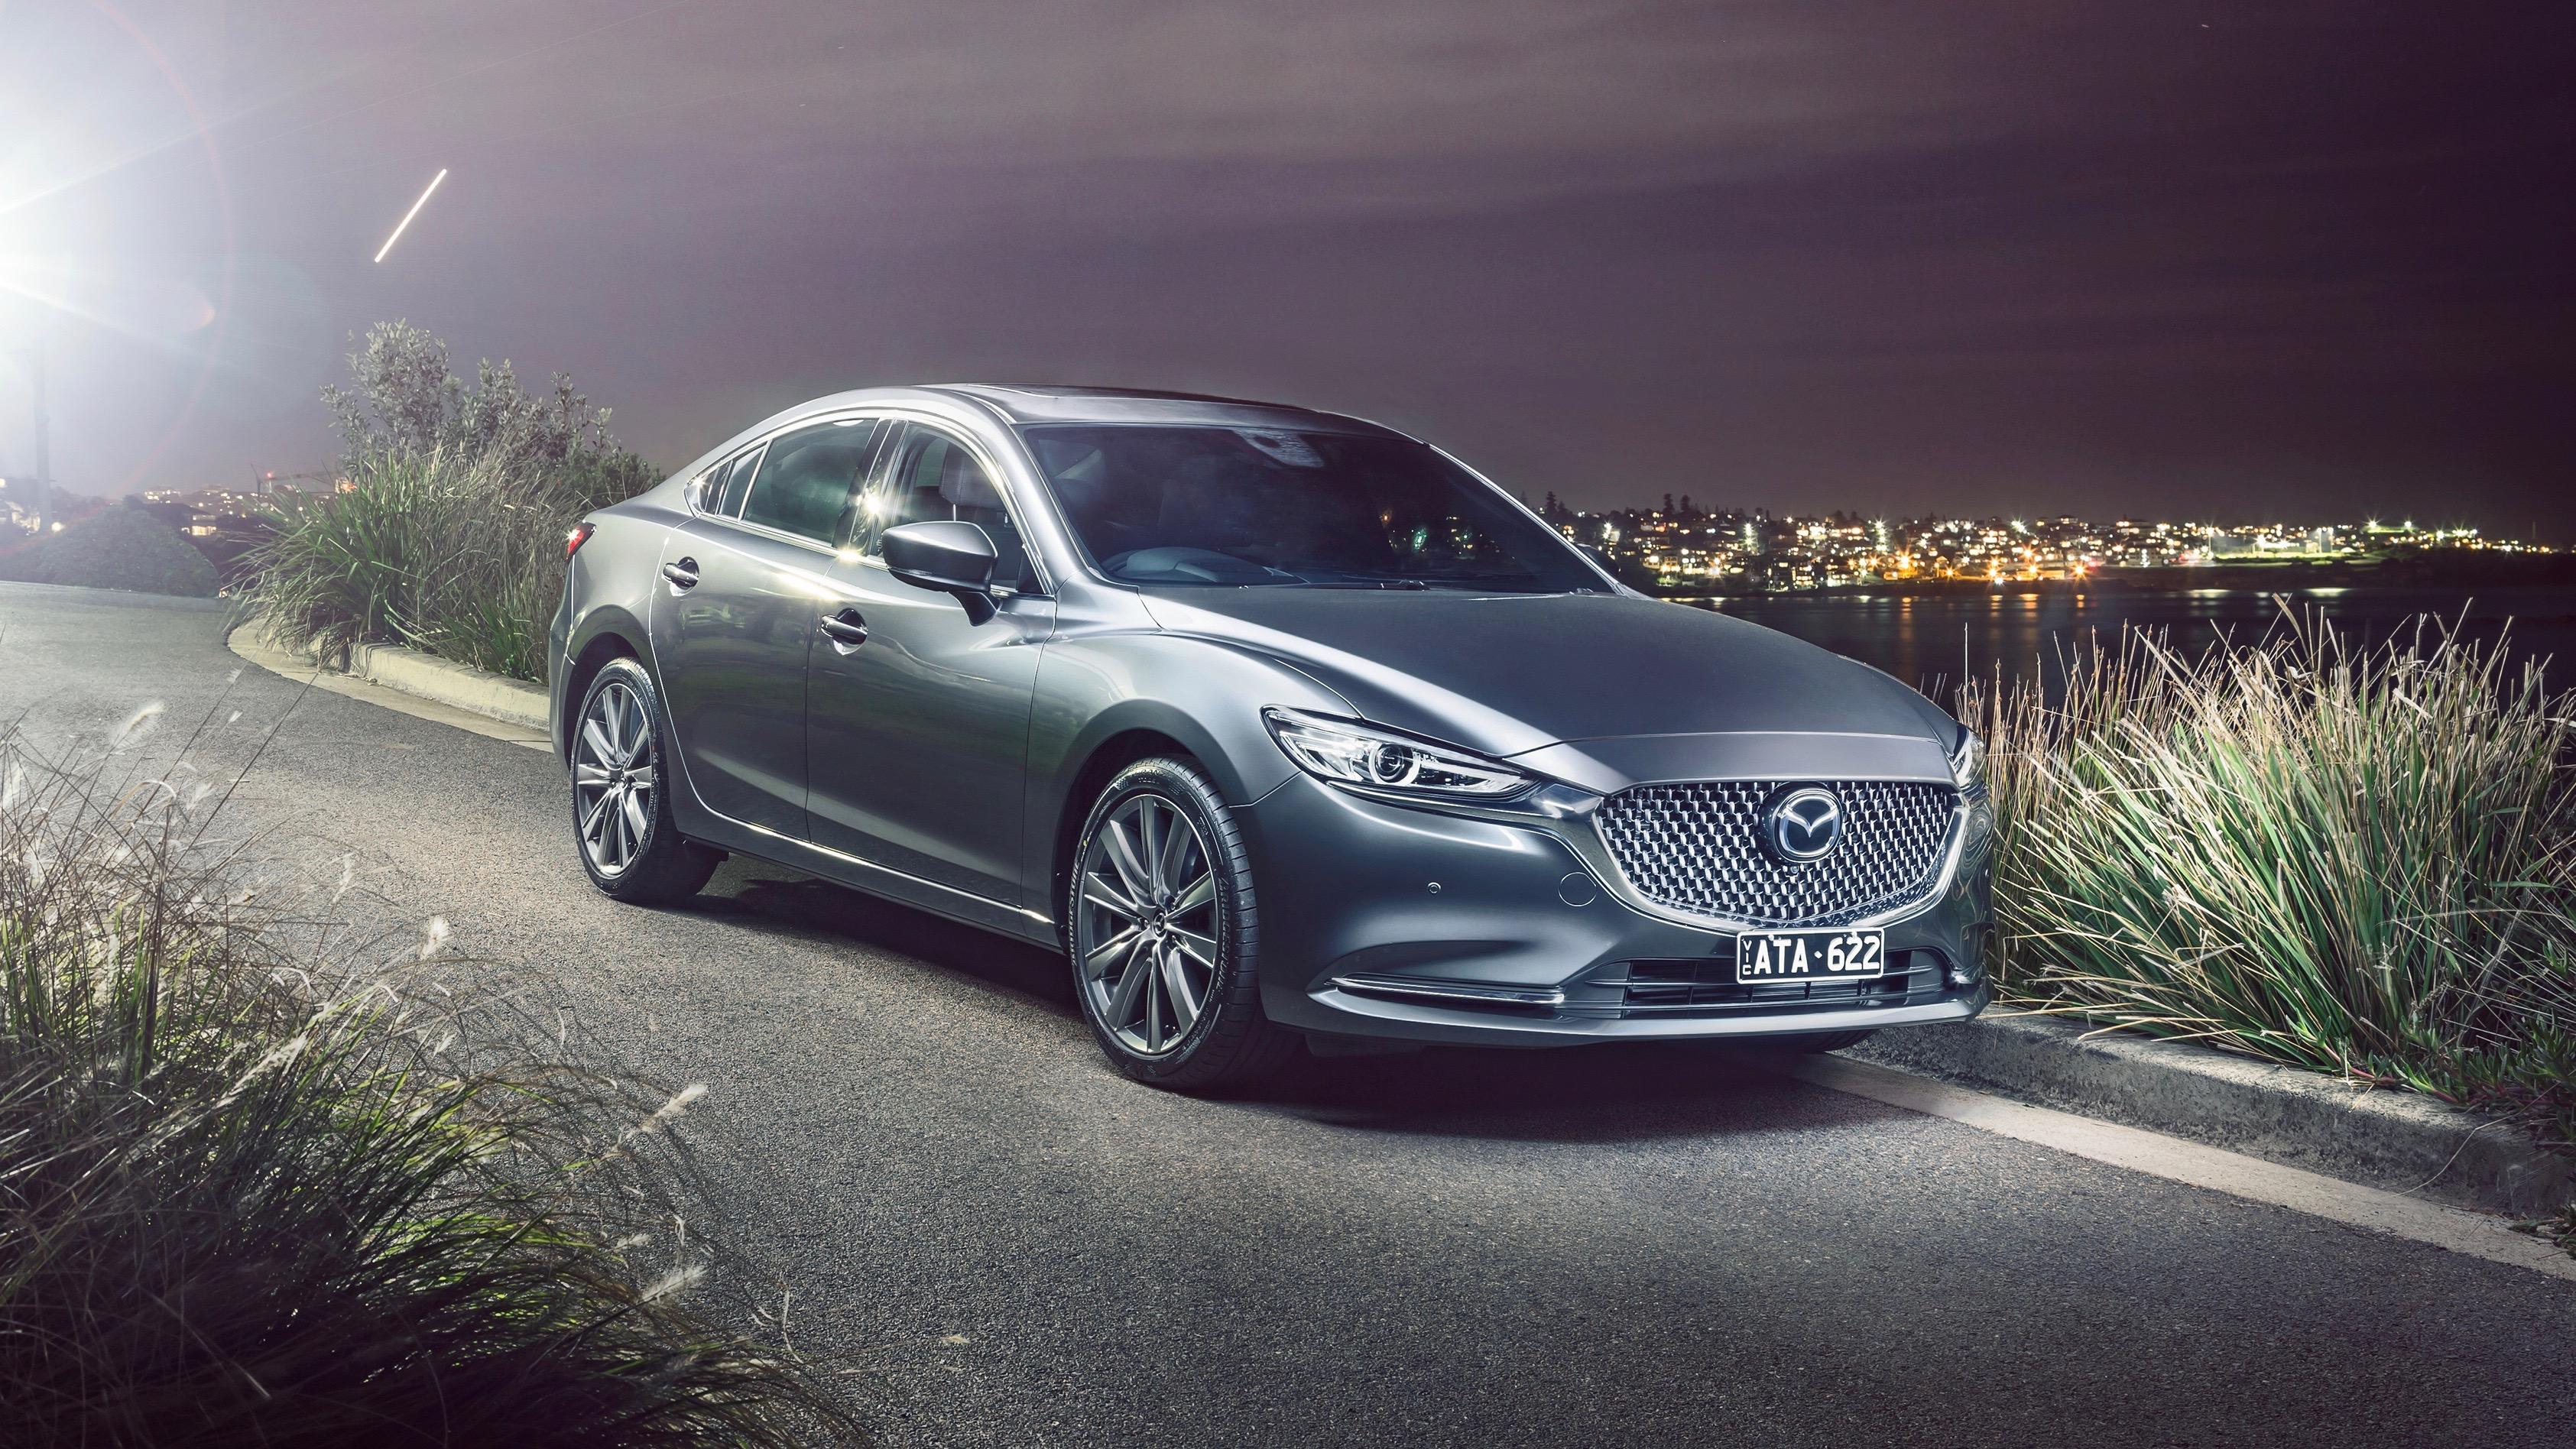 Kelebihan Kekurangan Mazda 6 2.5 Turbo Murah Berkualitas